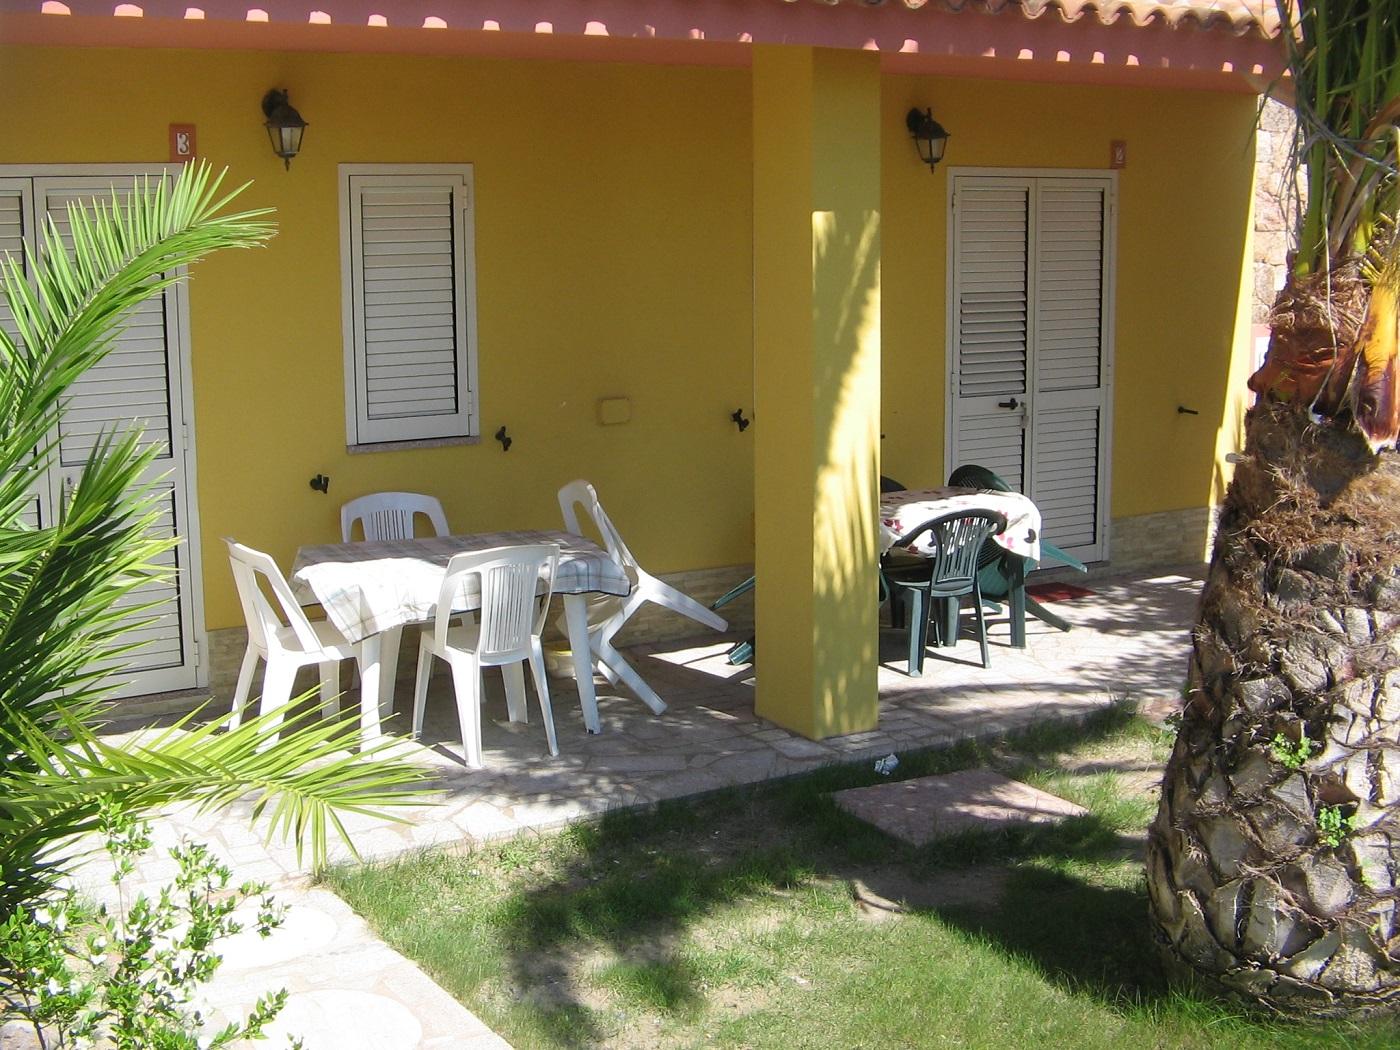 Badesi 2 zimmer-Wohnung mit Panoramablick 3 stück